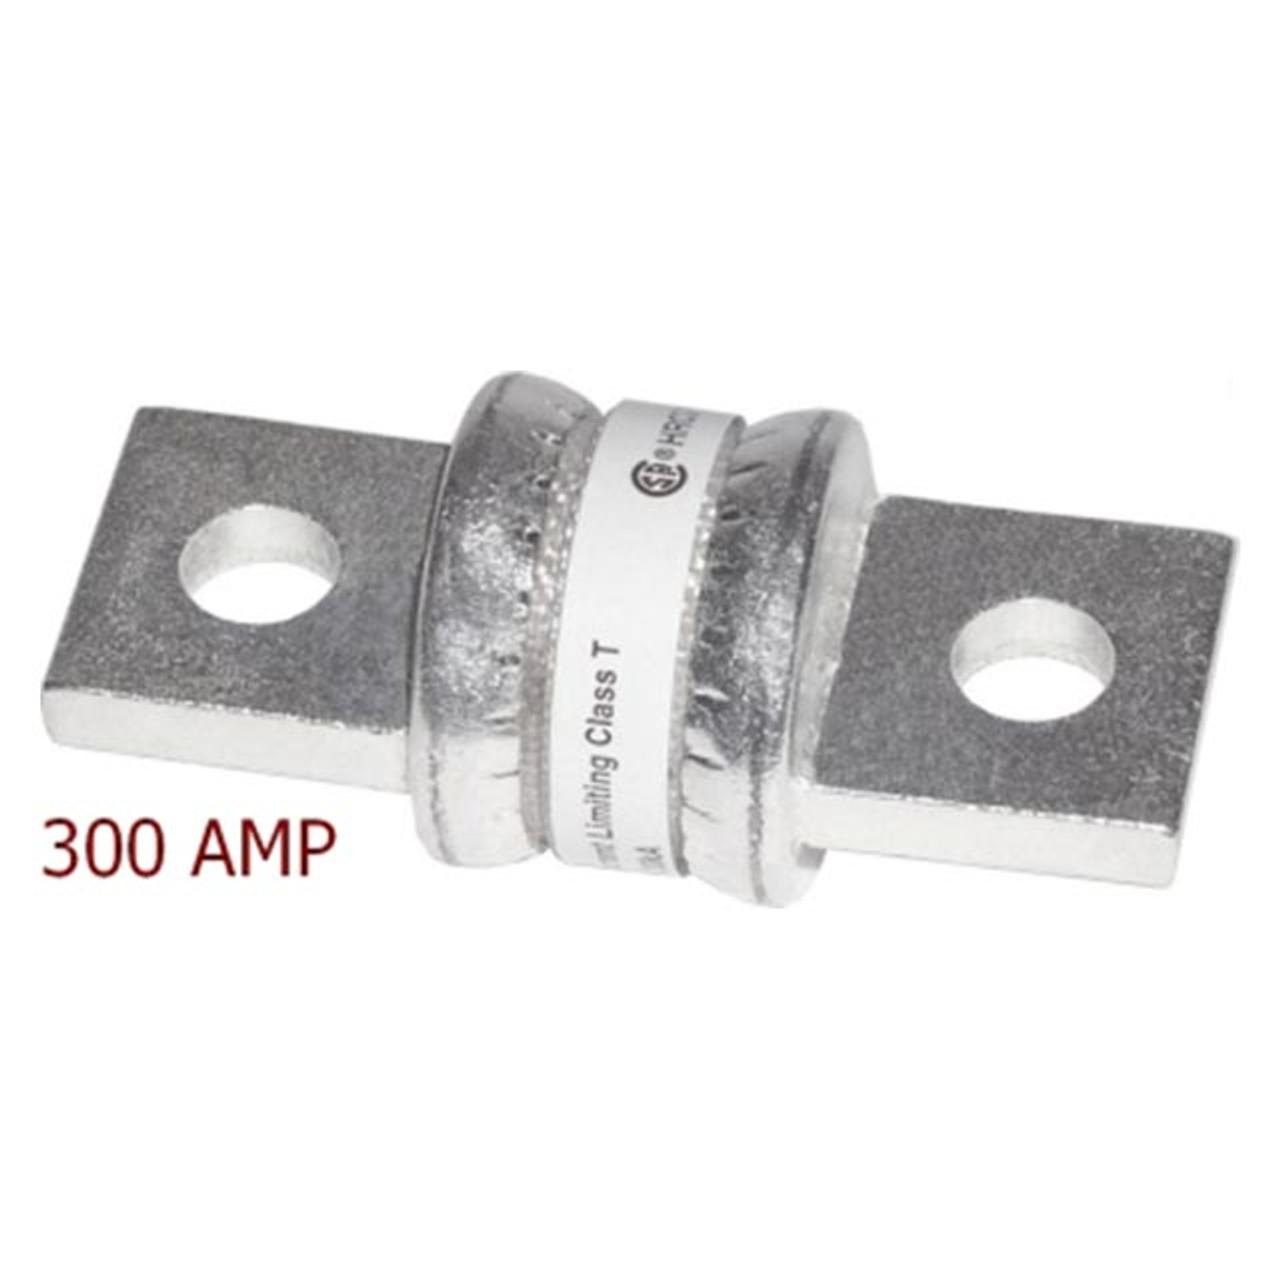 FUSE CLASS T 300AMP 300 AMP